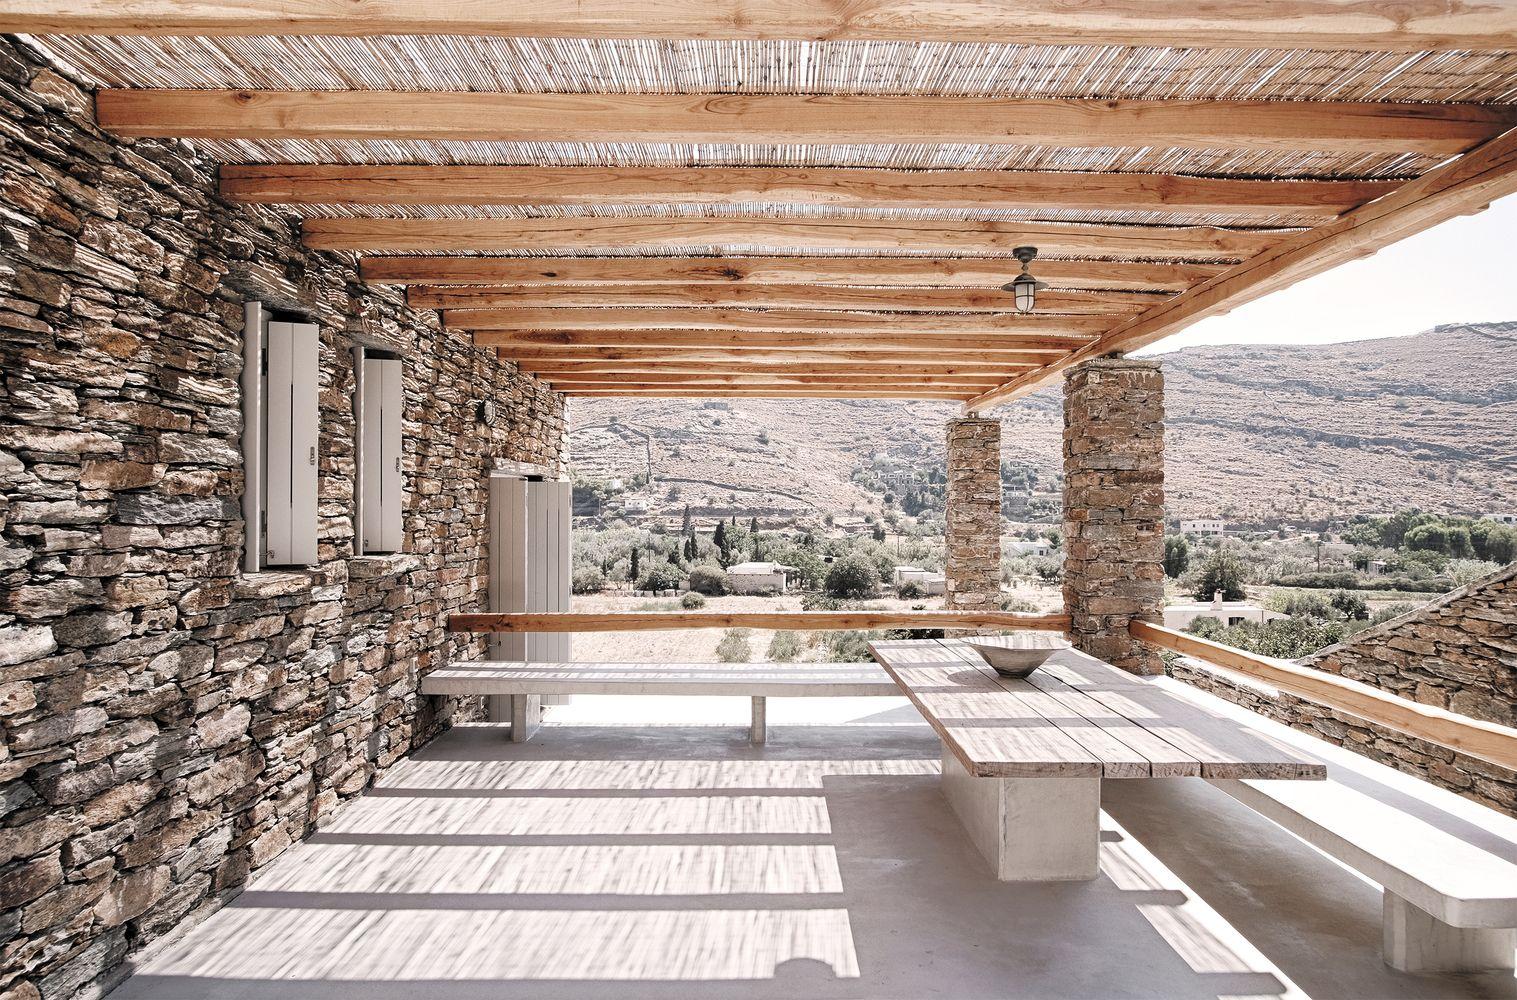 Gallery of Rocksplit House / Cometa Architects - 7